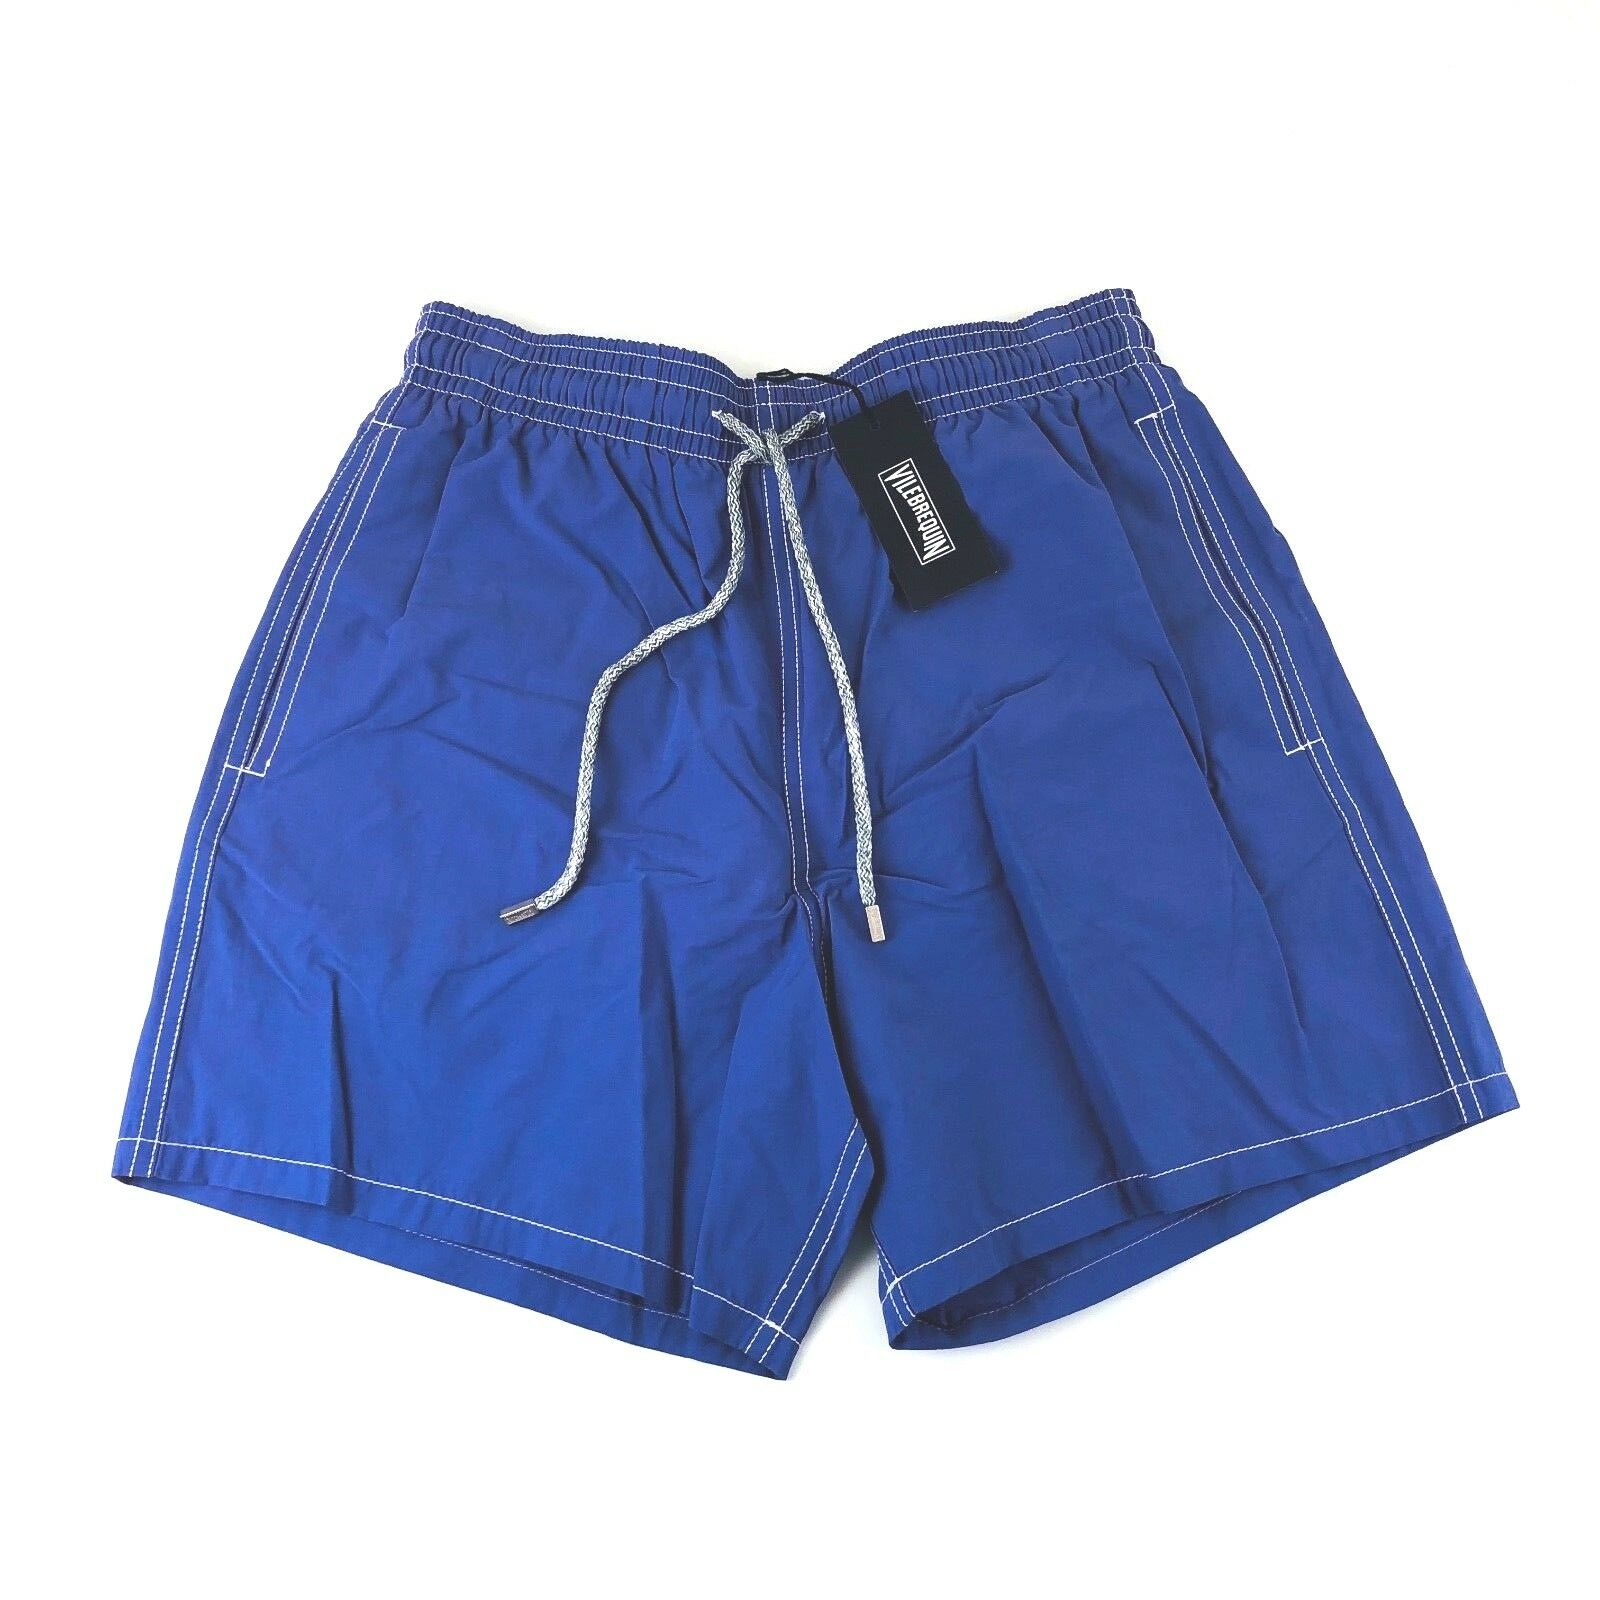 Vilebrequin Moorea Lavender Drawstring Liner Swim Trunks Shorts Men M L NWT